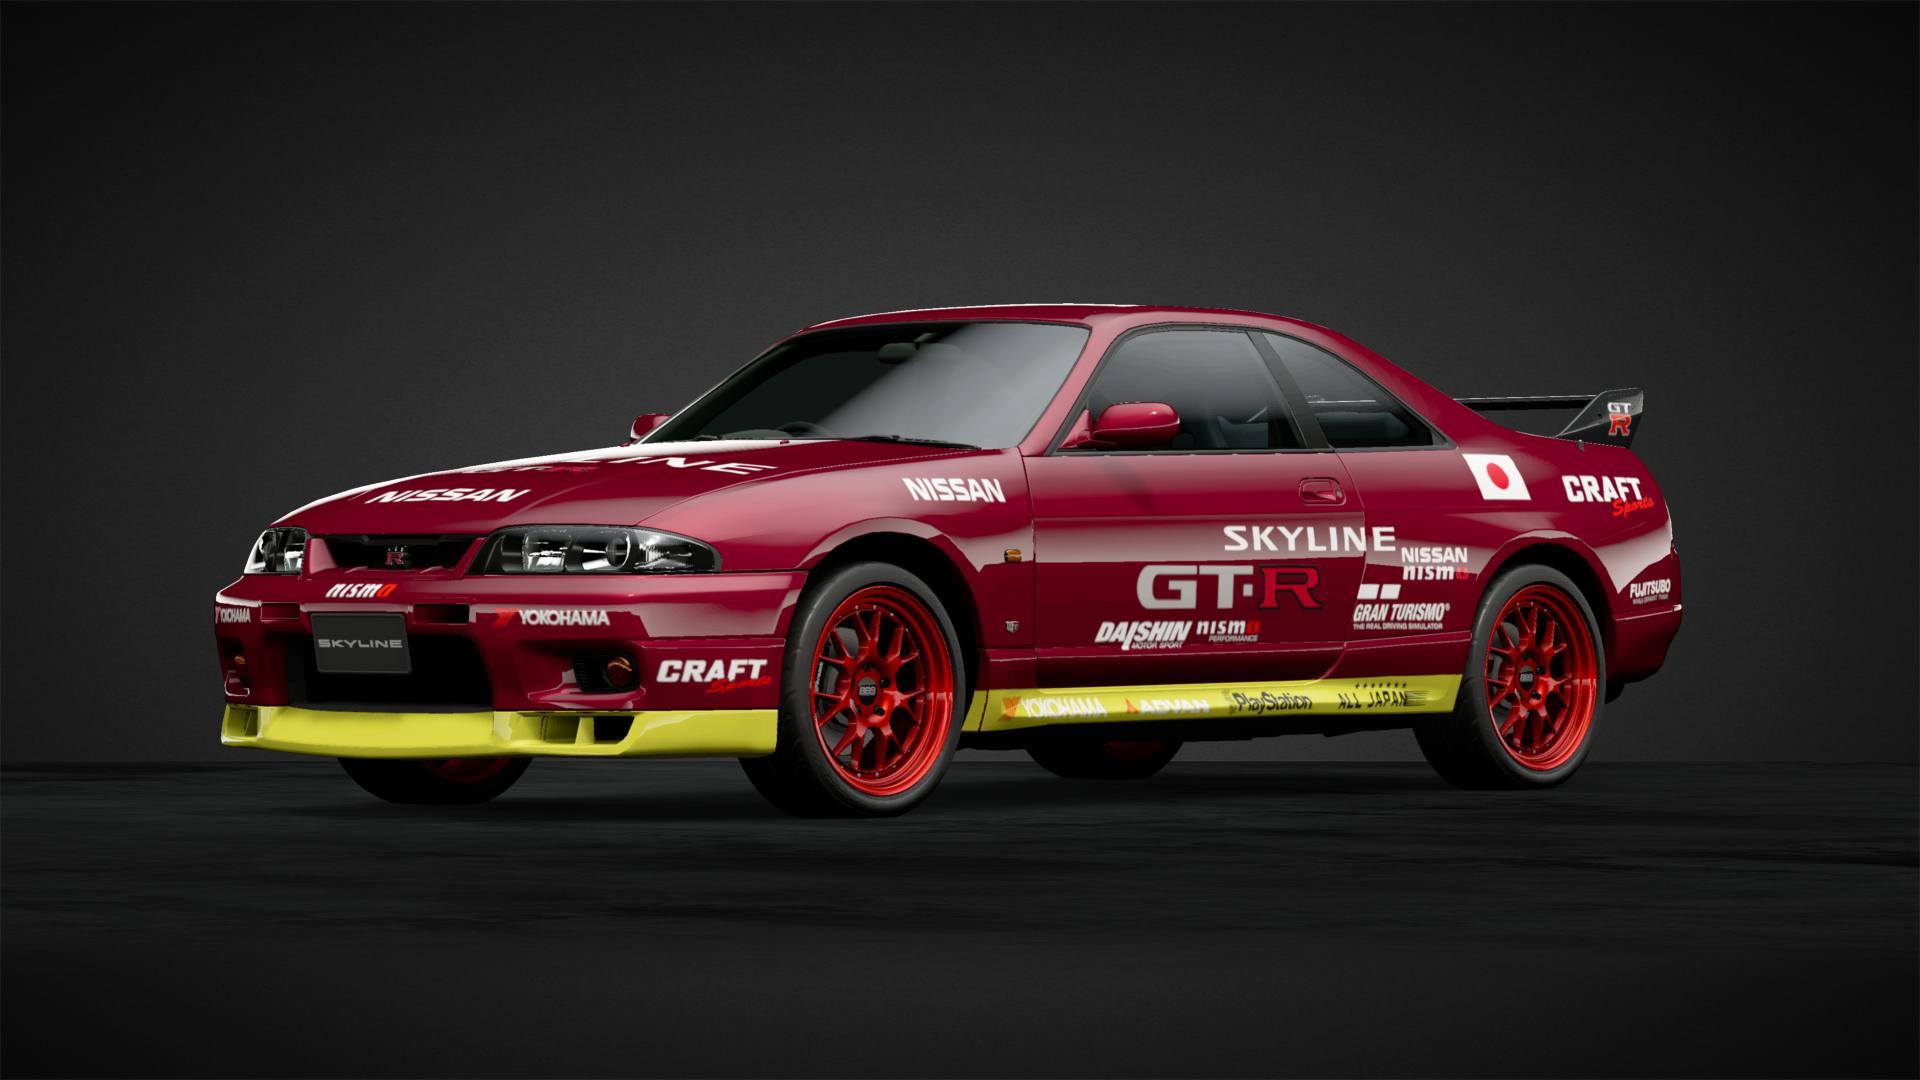 Gran Turismo 1 R33 Skyline - Car Livery by muodybp